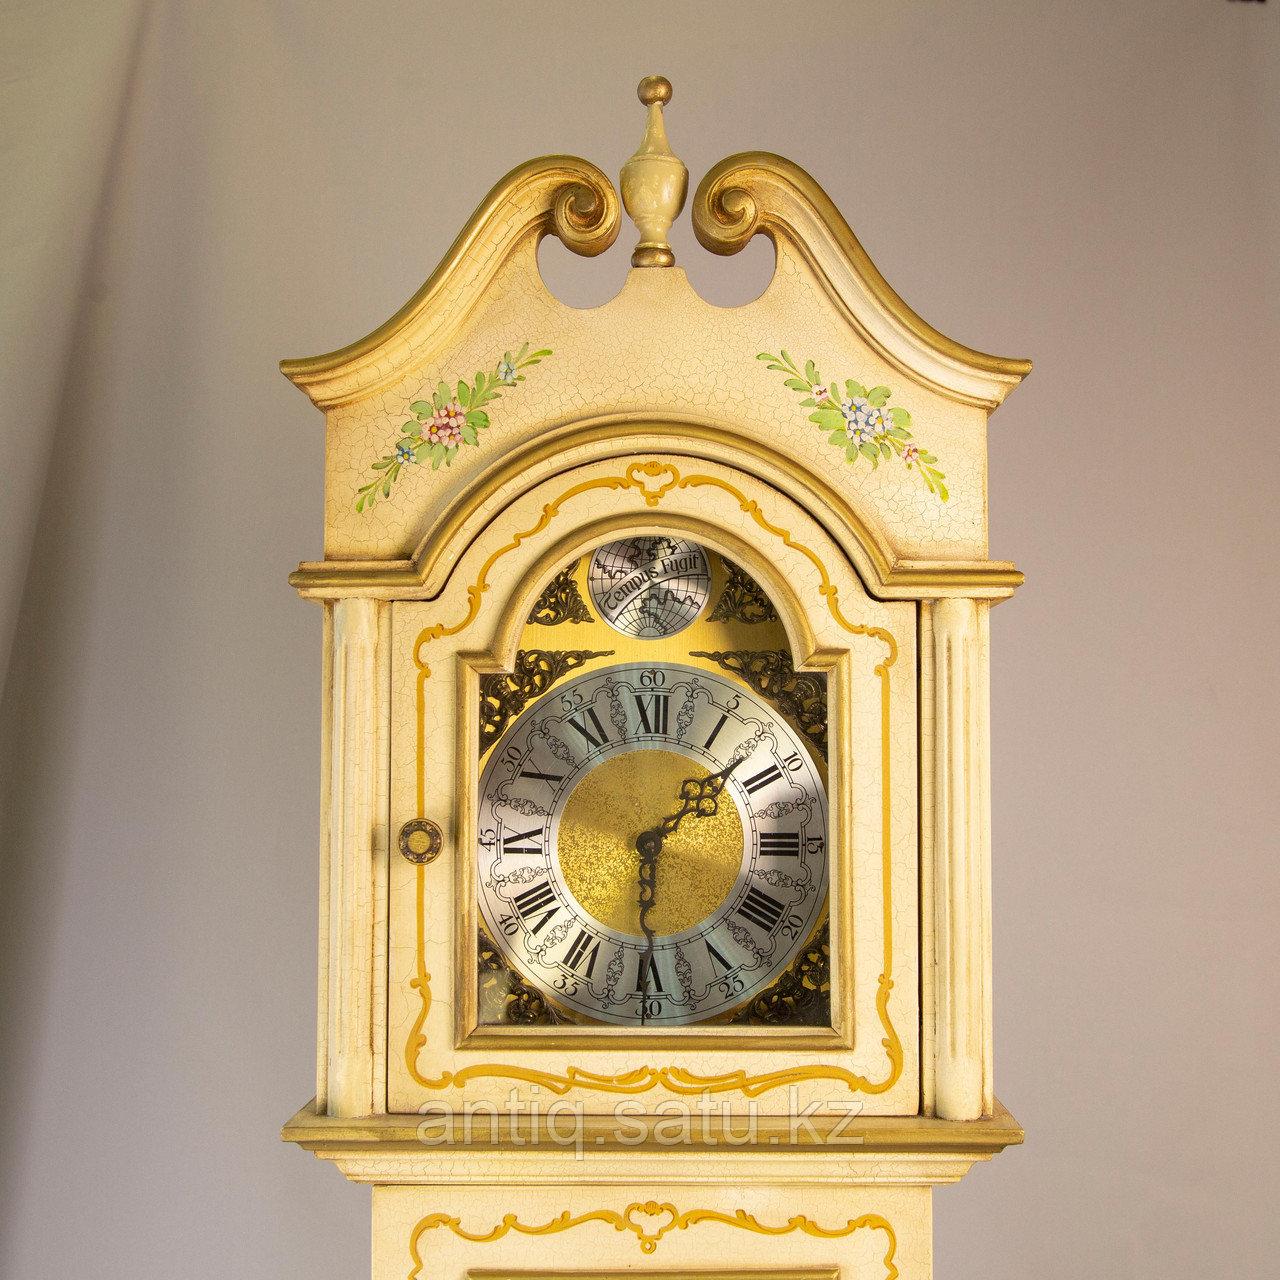 Напольные часы. Часовая мастерская Franz Hermle & Sohne. Германия. 1977 год. - фото 6